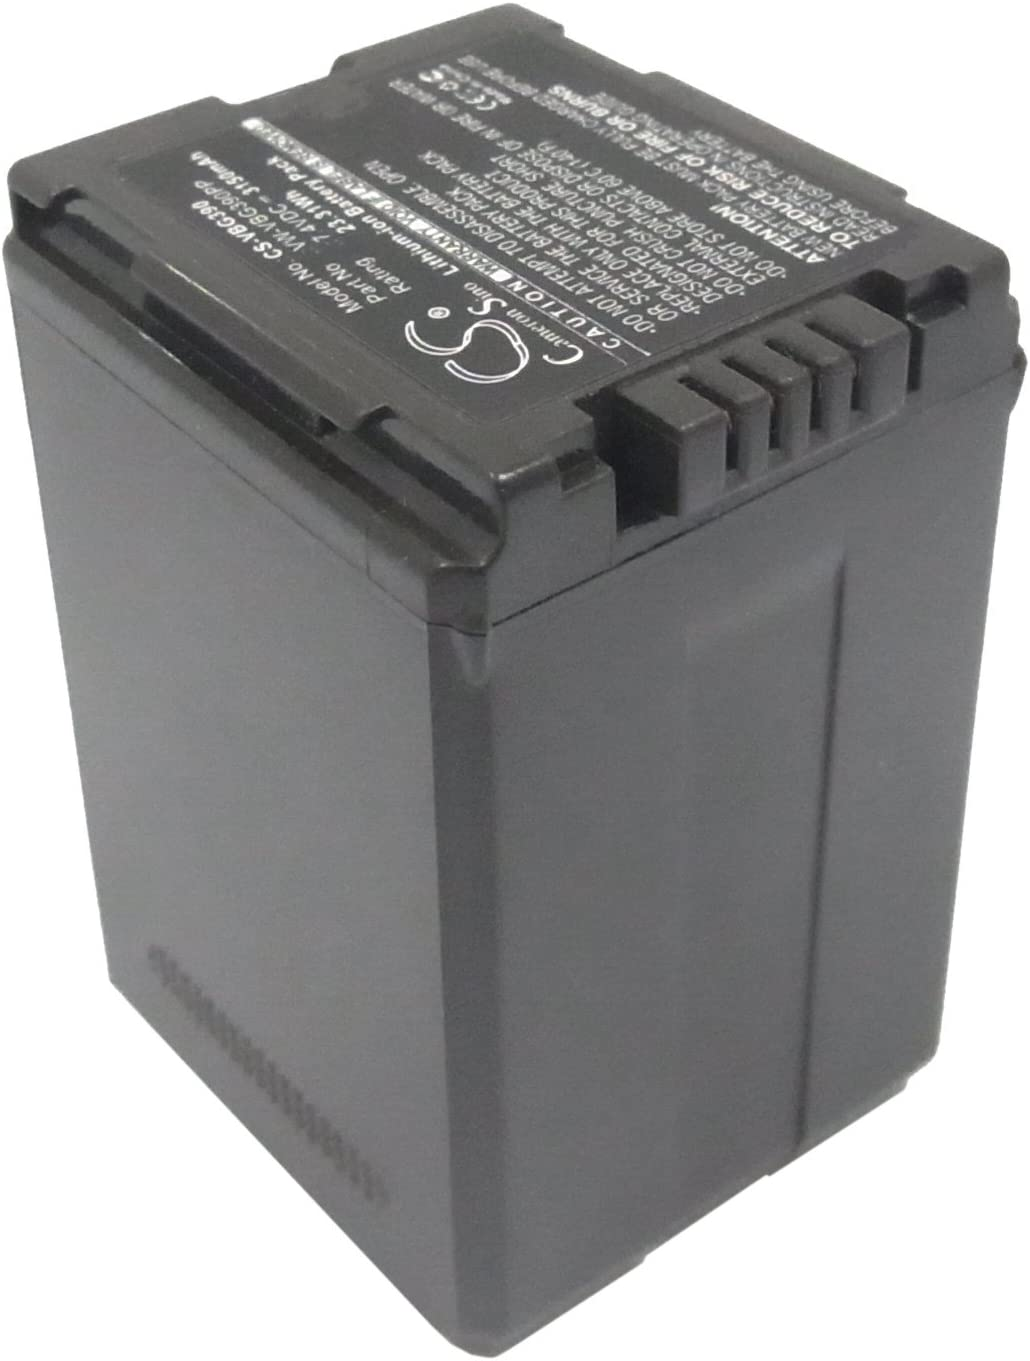 HDC-HS20K HDC-DX1 HDC-DX3 HDC-HS20 HDC-HS200K AG-HMC40 HDC-HS100GK HDC-HS25 3150mAh // 23.31Wh HDC-HS100 AG-HMC70 HDC-HS200 HSDZ Battery Suitable for Panasonic AG-HMC150